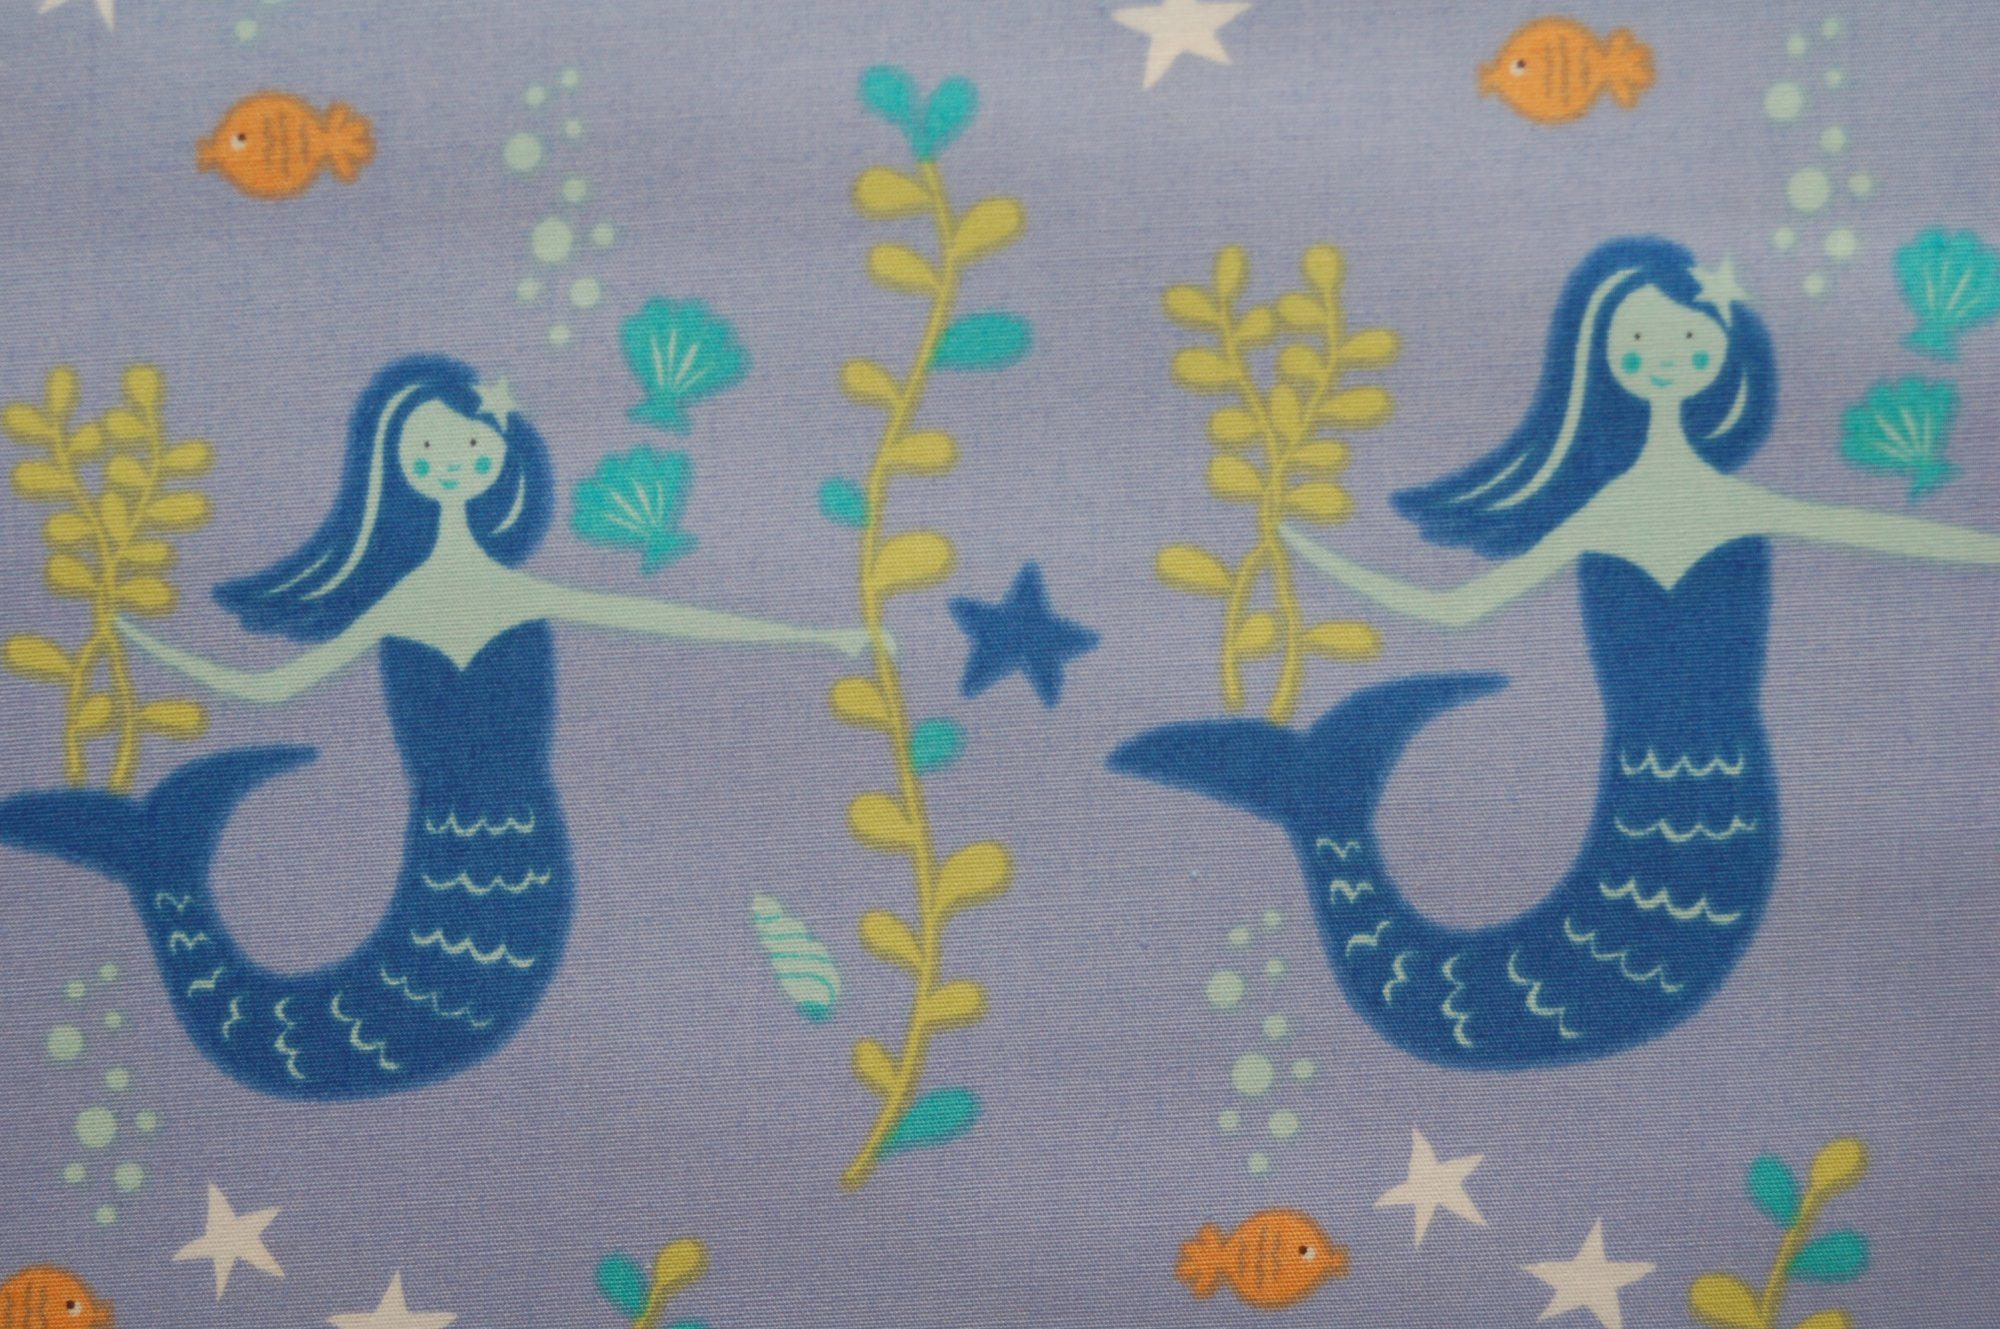 Little Mermaid from Monaluna